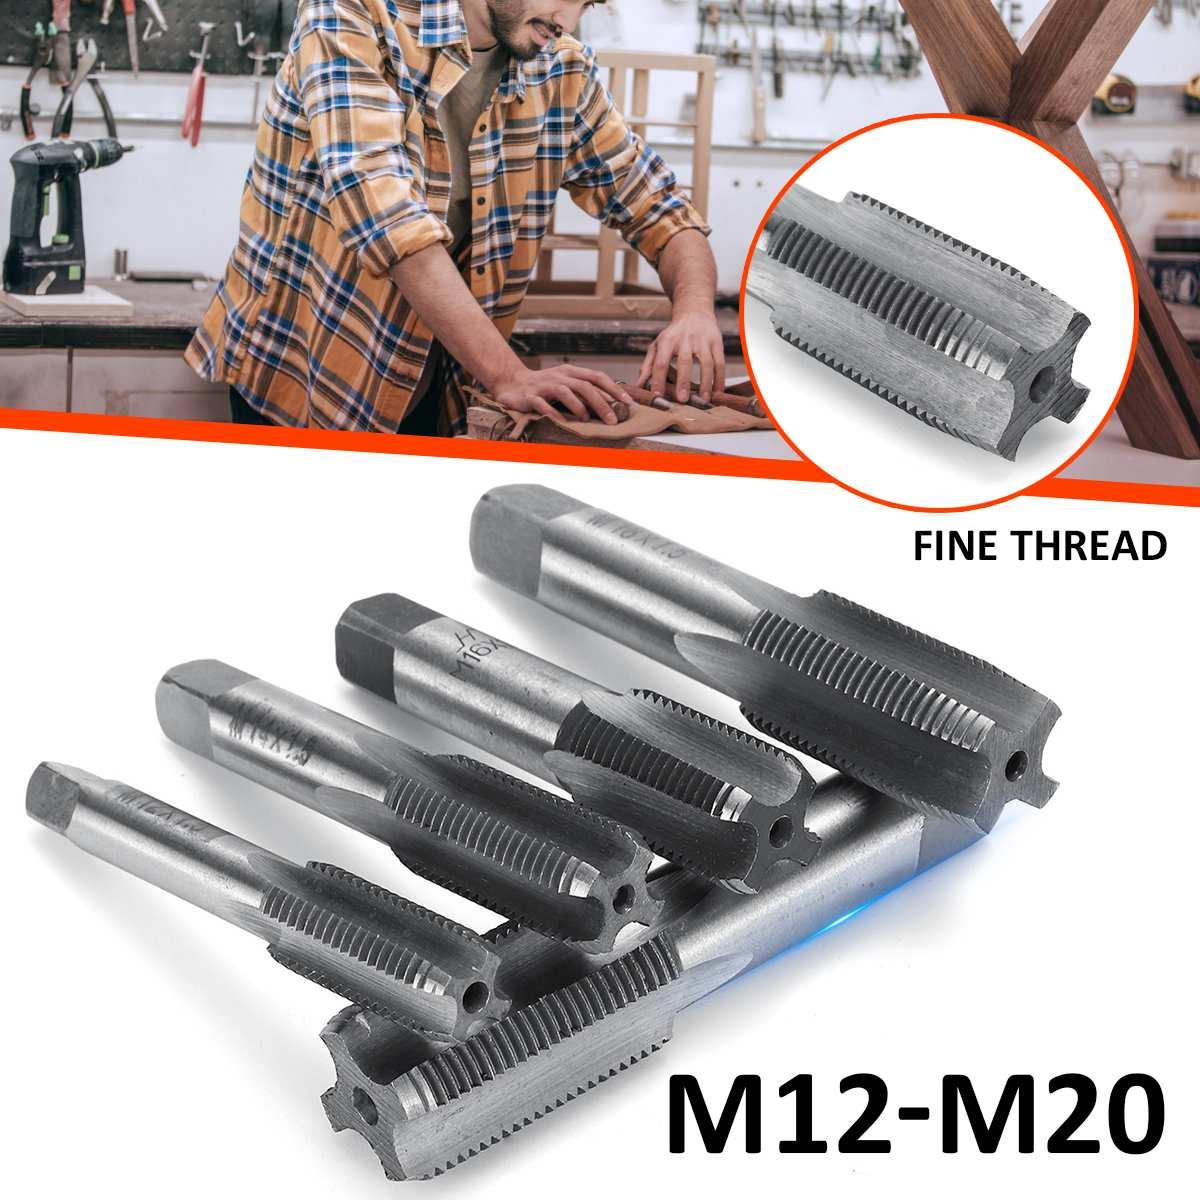 1pc HSS Machine M18 X 1mm Plug Tap and 1pc M18 X 1.0mm Die Threading Tool